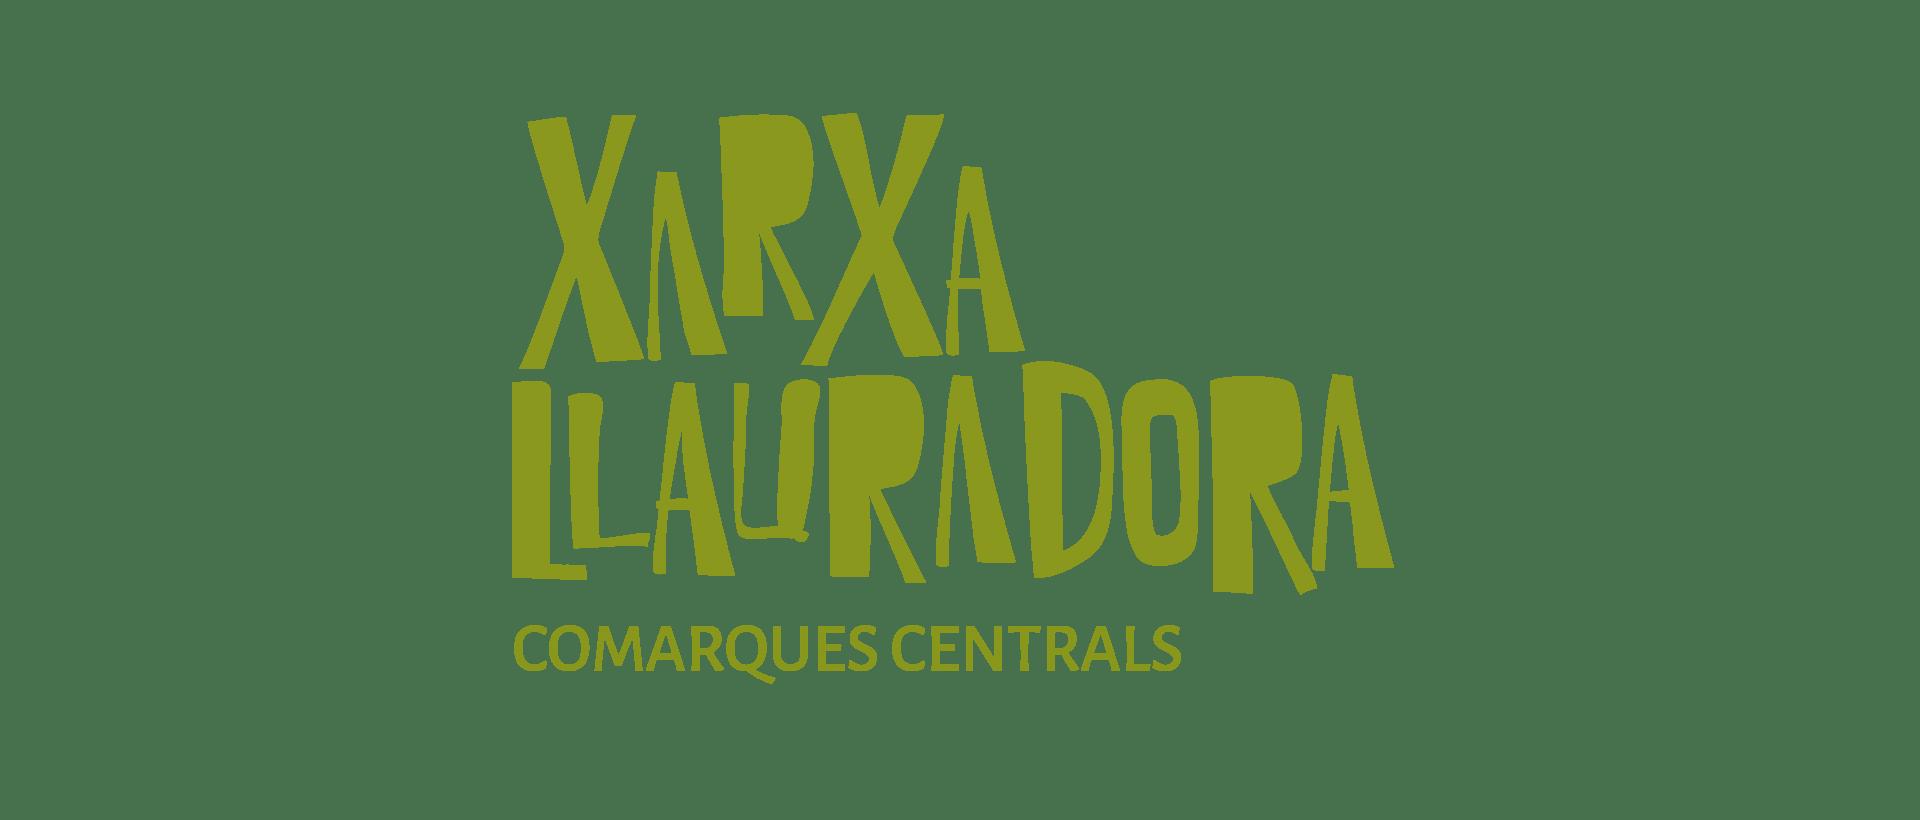 logo-xarxa-cabecera